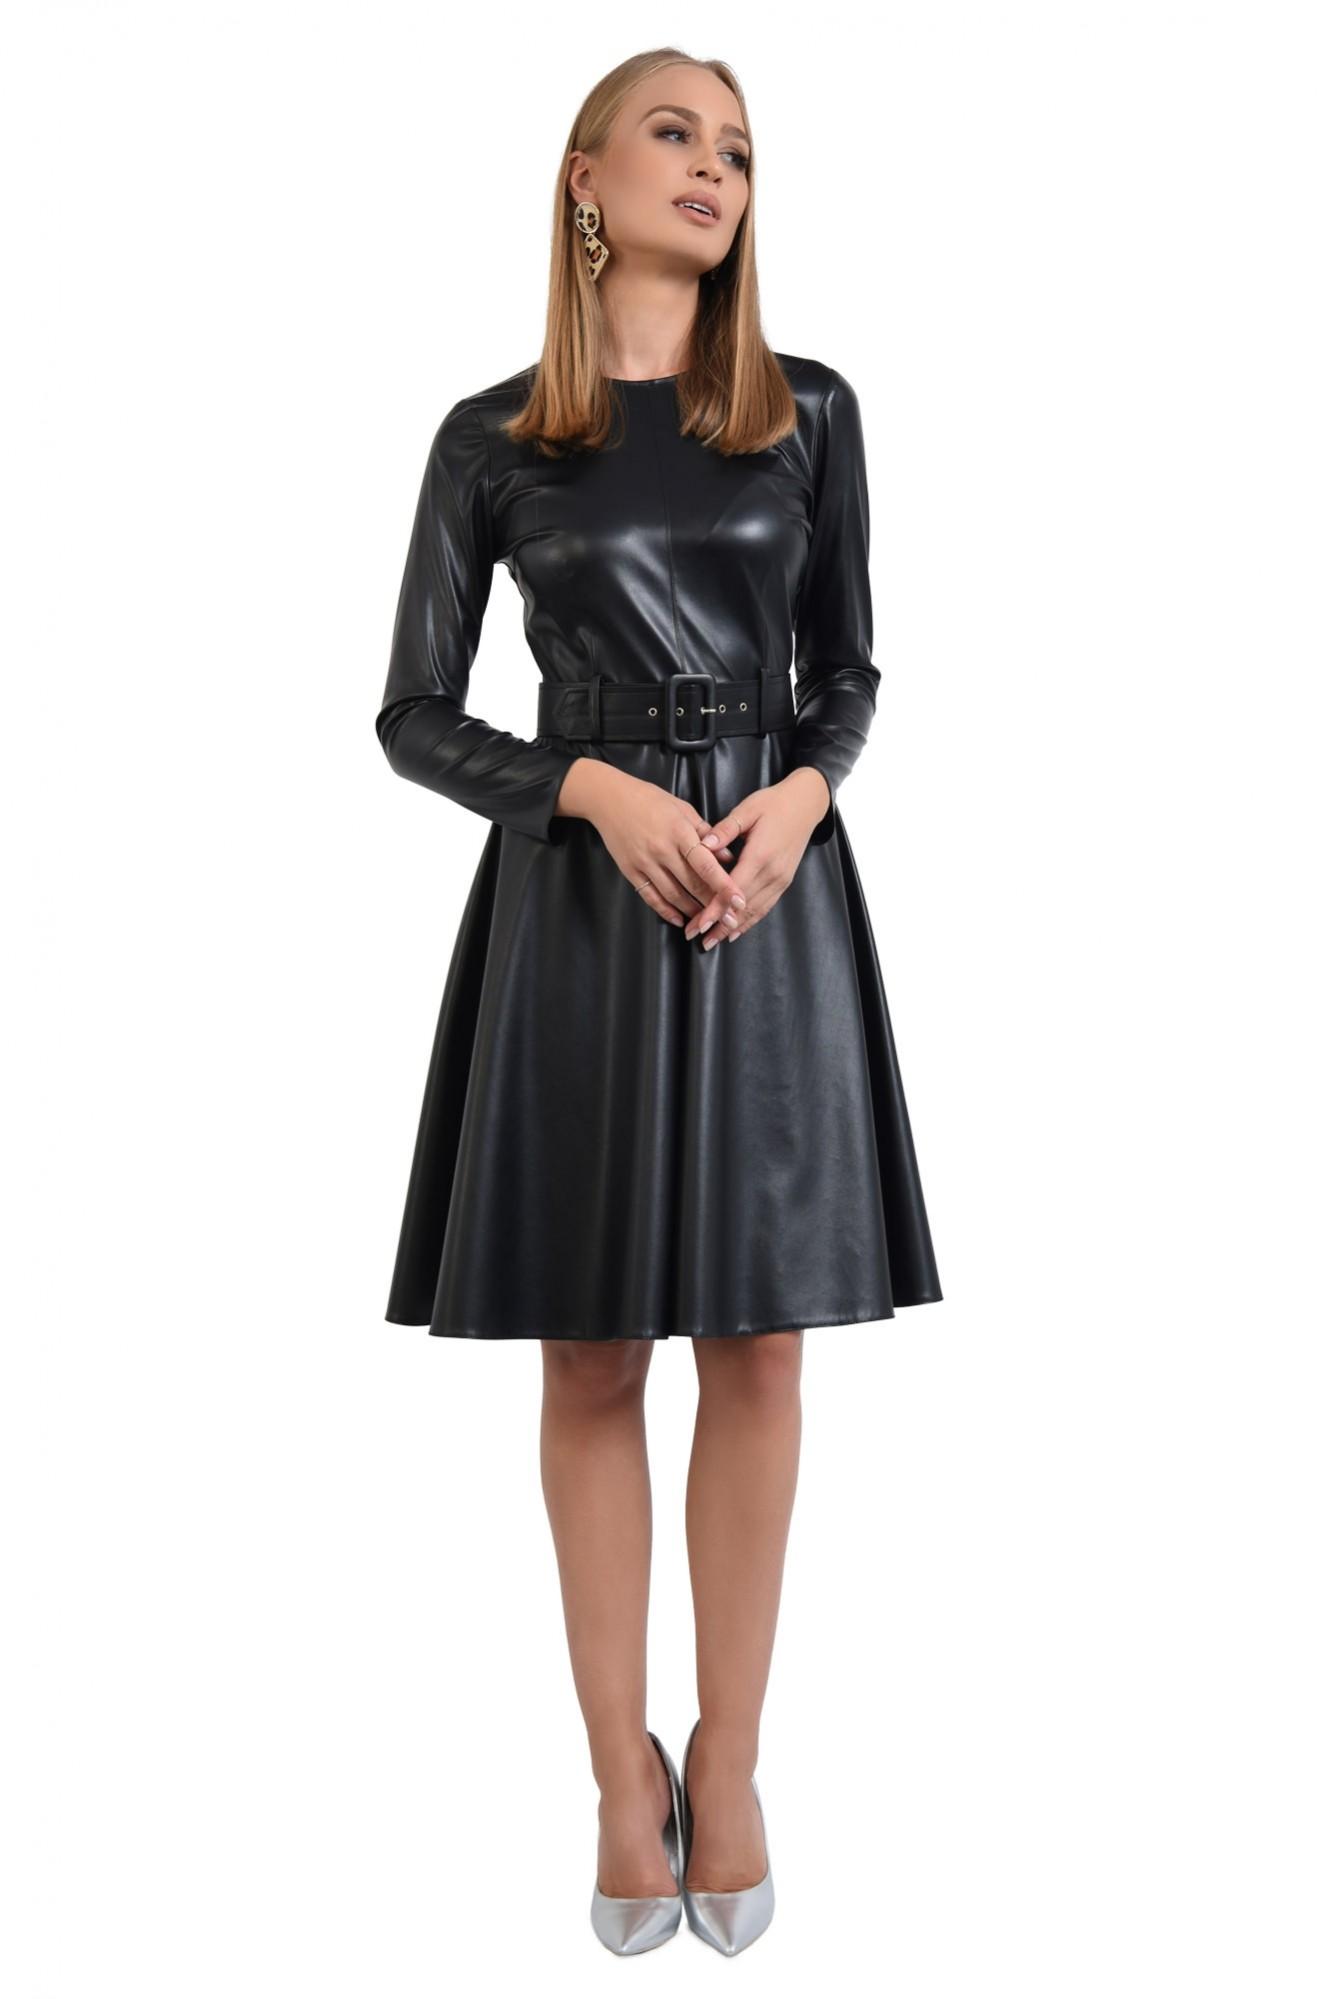 0 - rochie casual neagra, cusatura mediana, fermoar la spate, rochii online